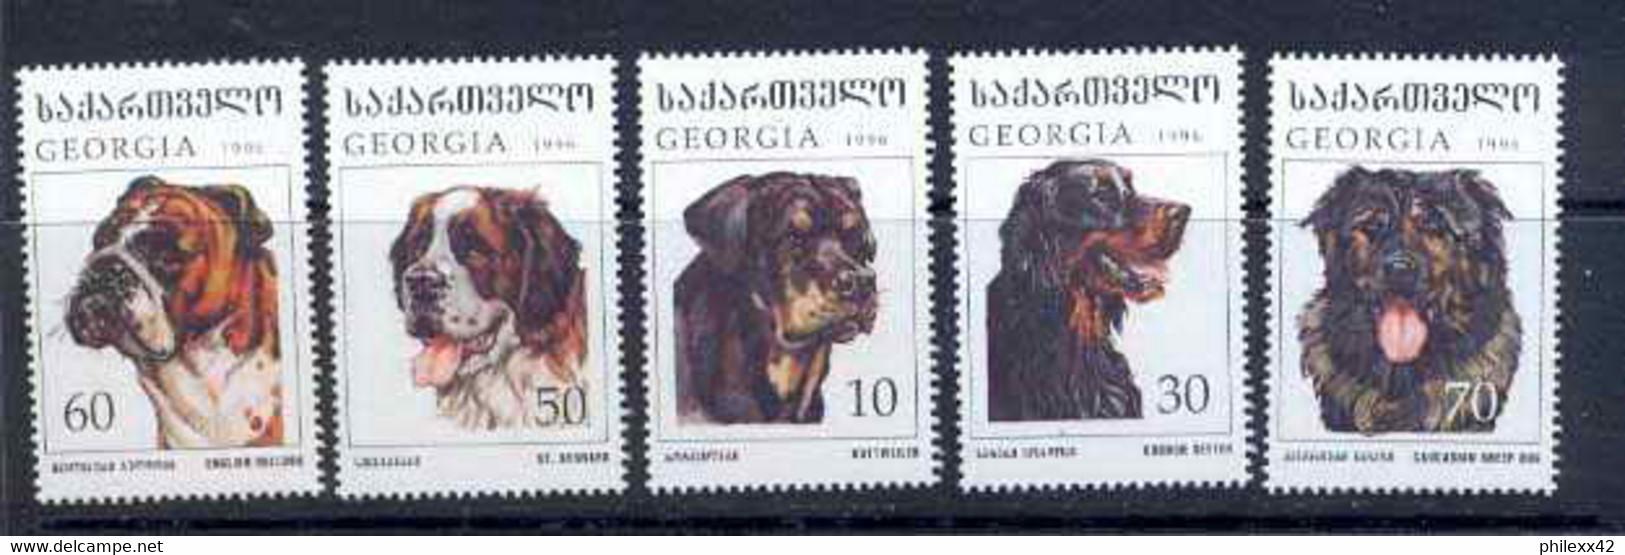 125 Géorgie (Georgia) N° 191 / 195 Chiens (chien Dog Dogs) COTE 6 EUROS - Géorgie